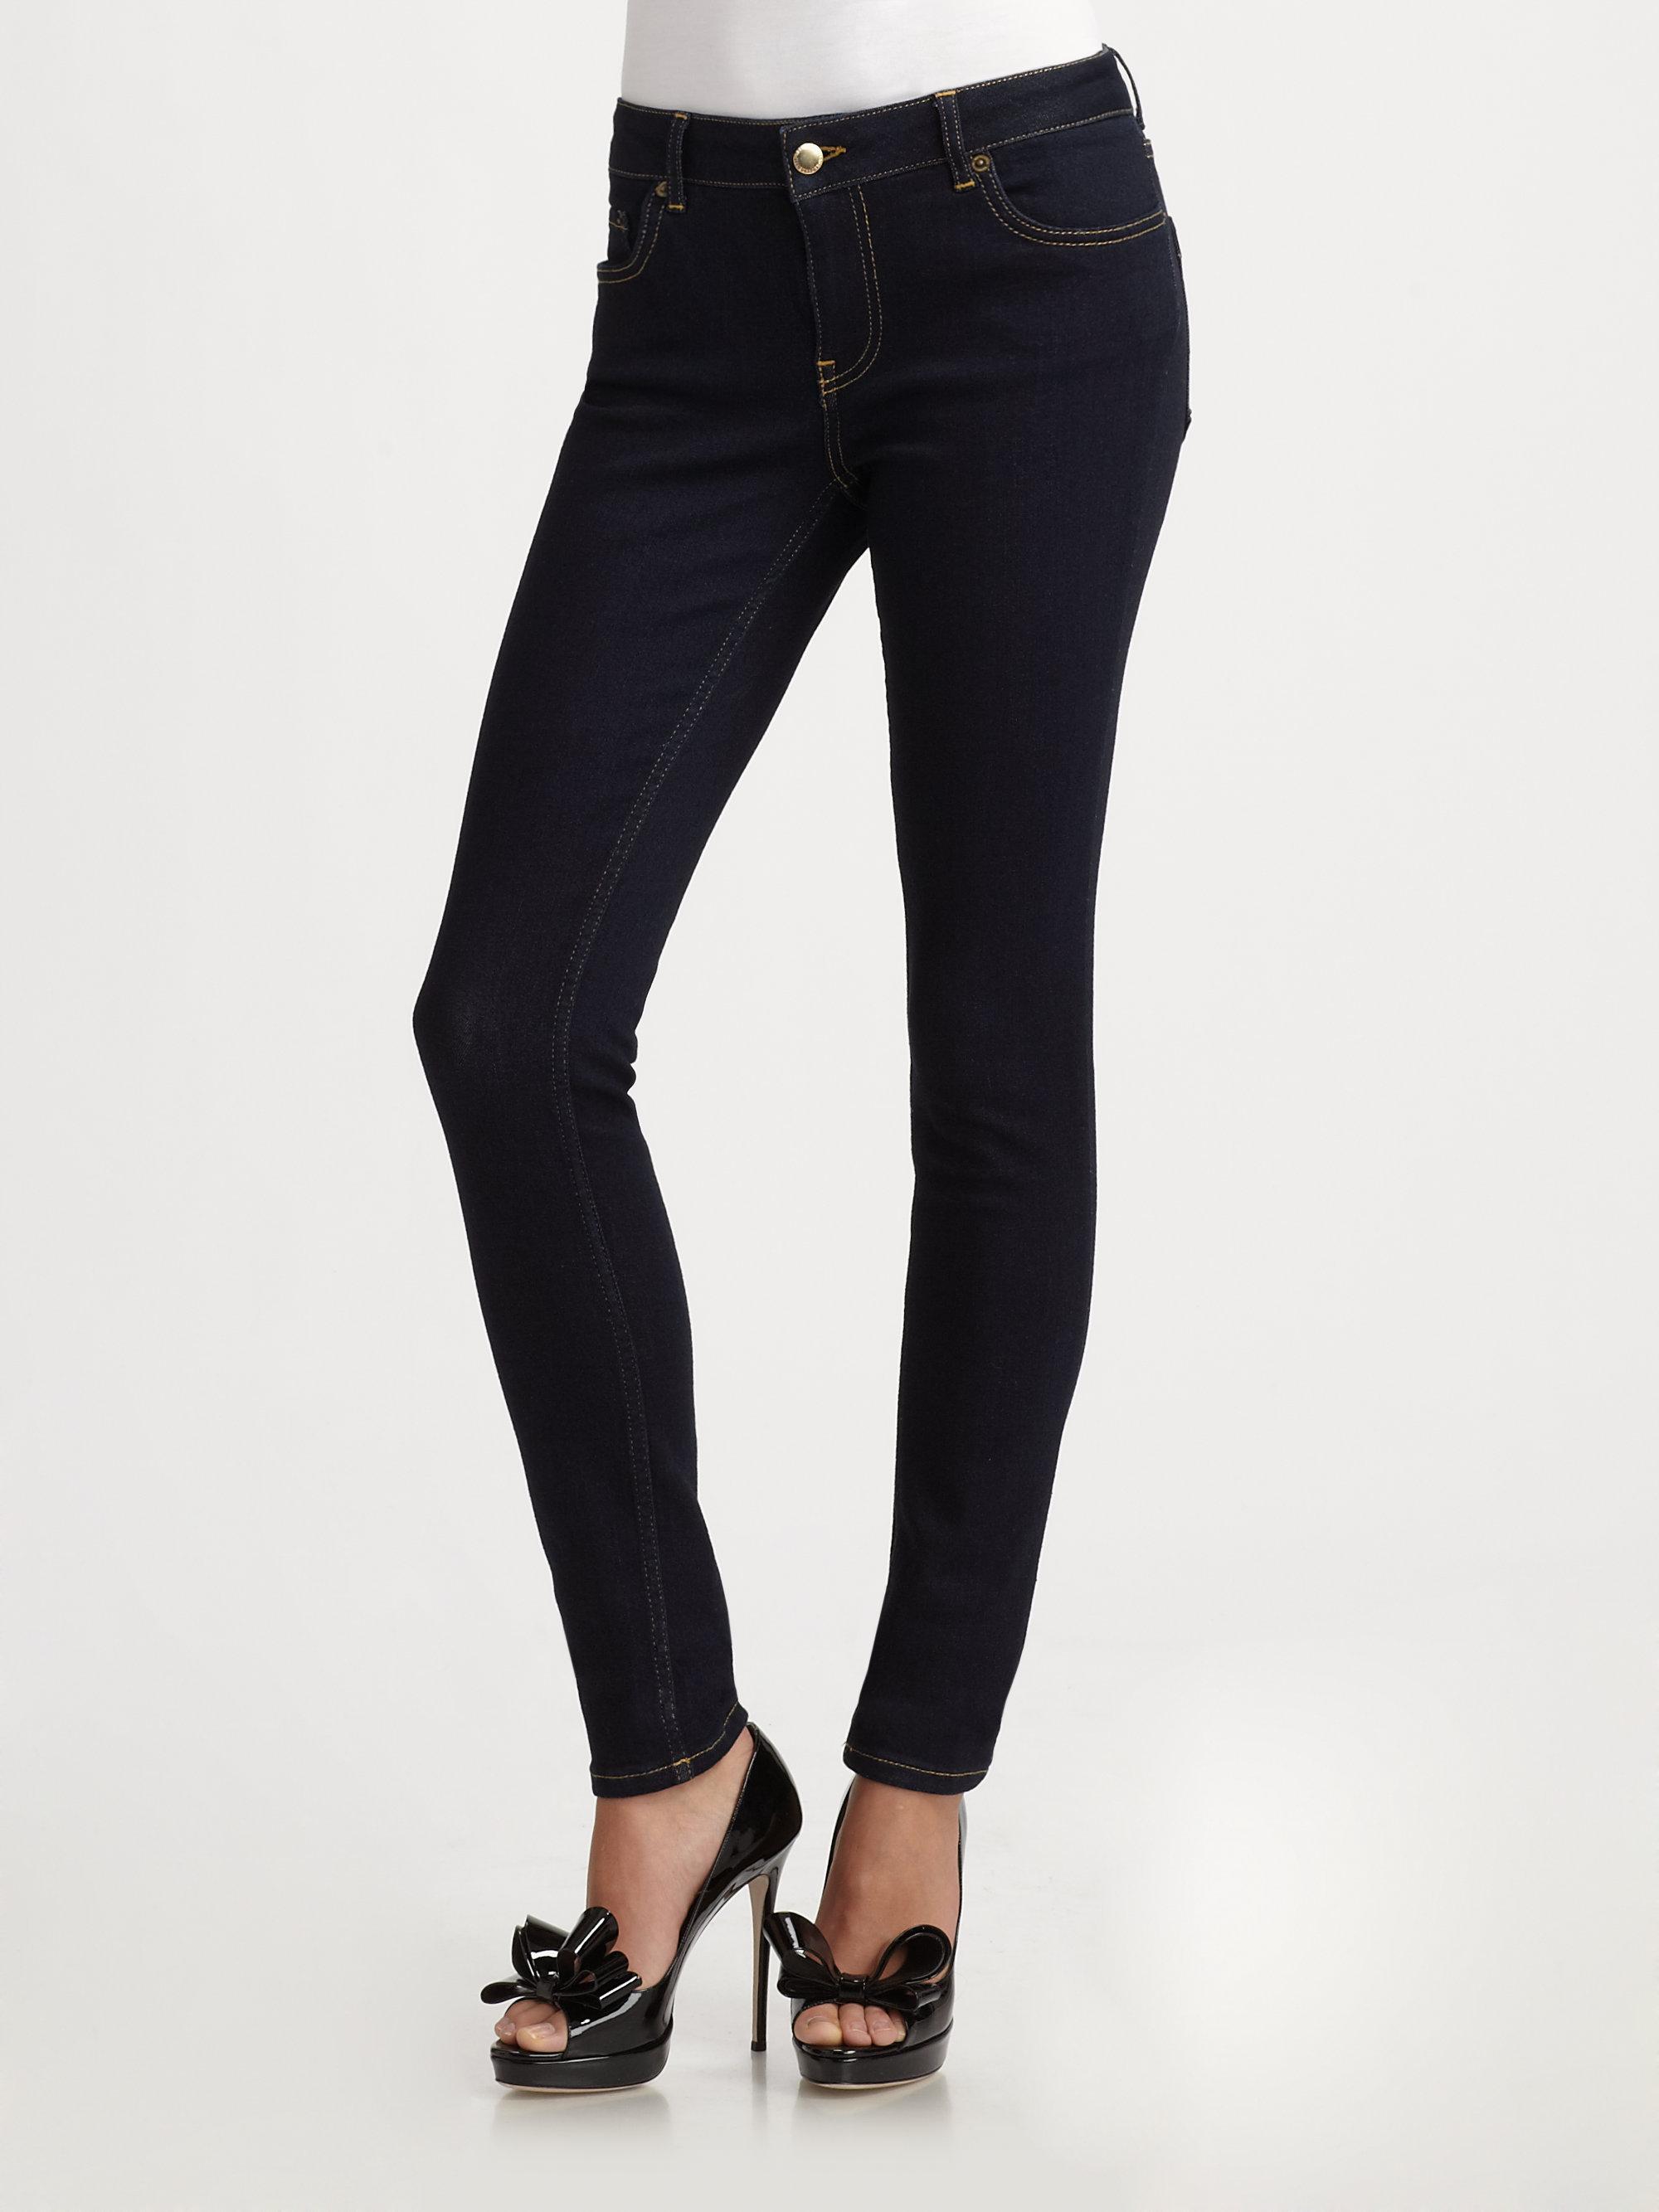 Red valentino Super Stretch Skinny Jeans in Blue | Lyst